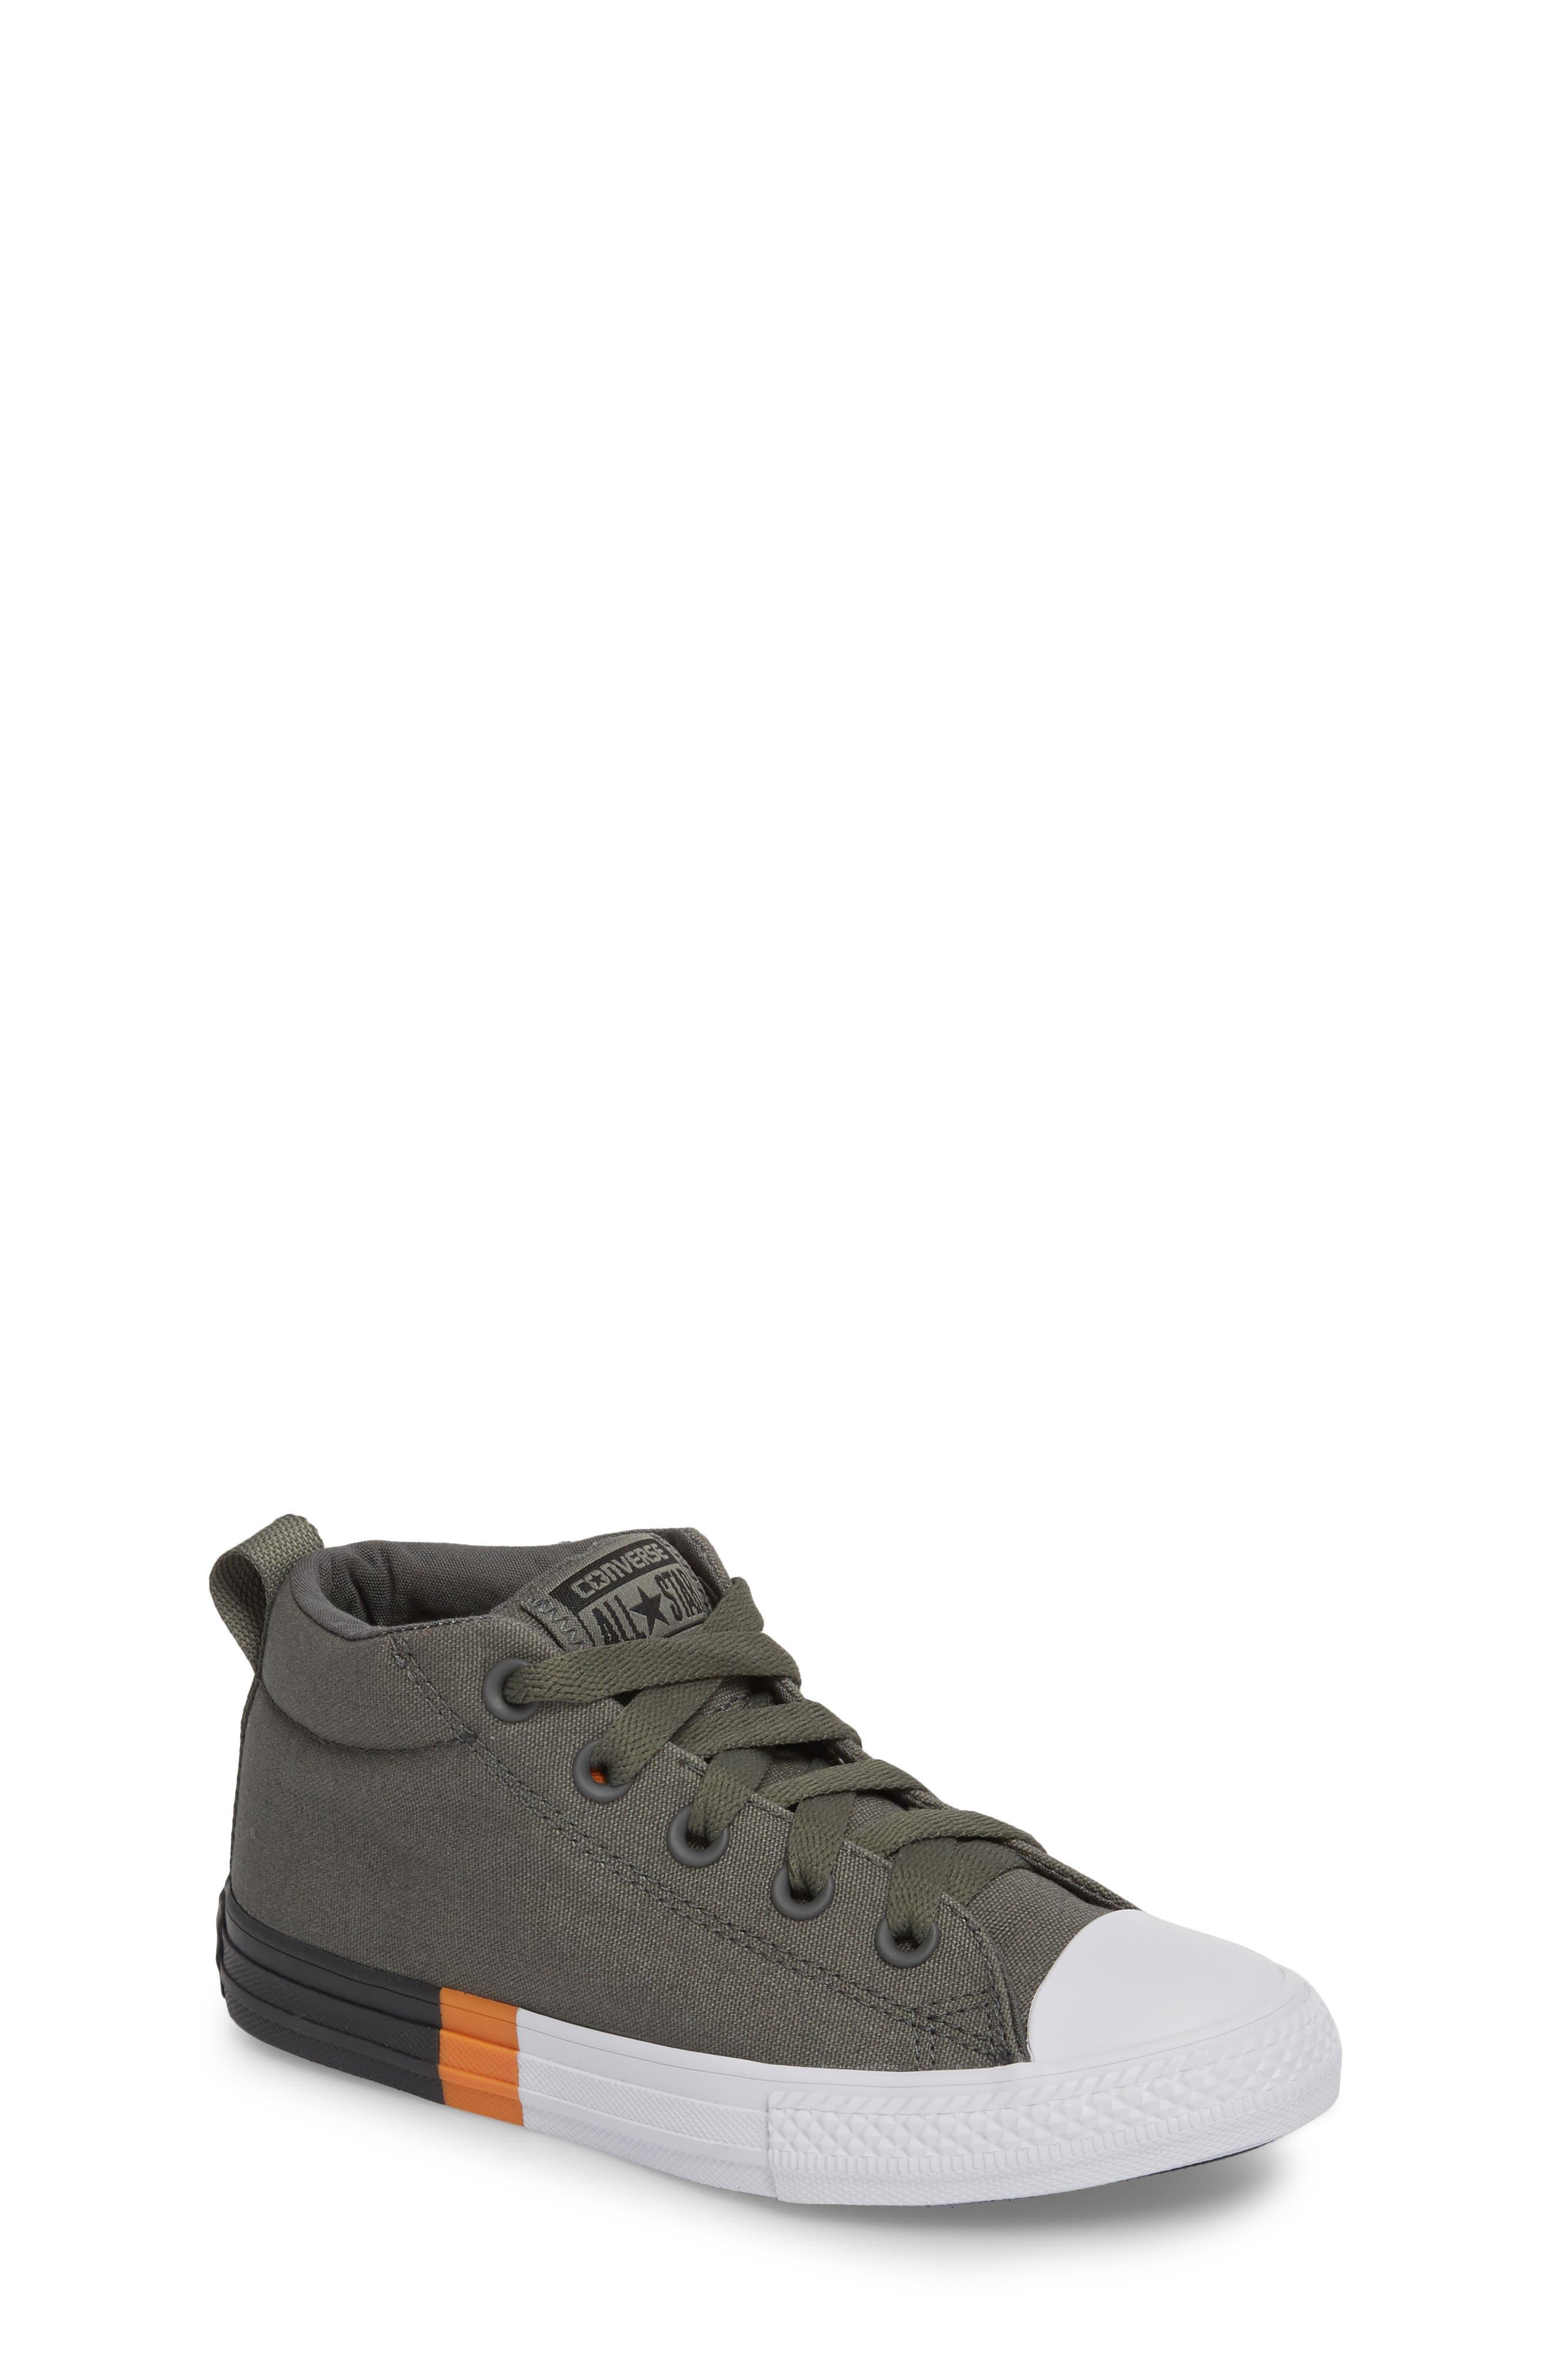 Converse Chuck Taylor® All Star® Street Colorblock Mid Top Sneaker (Baby, Walker, Toddler, Little Kid & Big Kid)